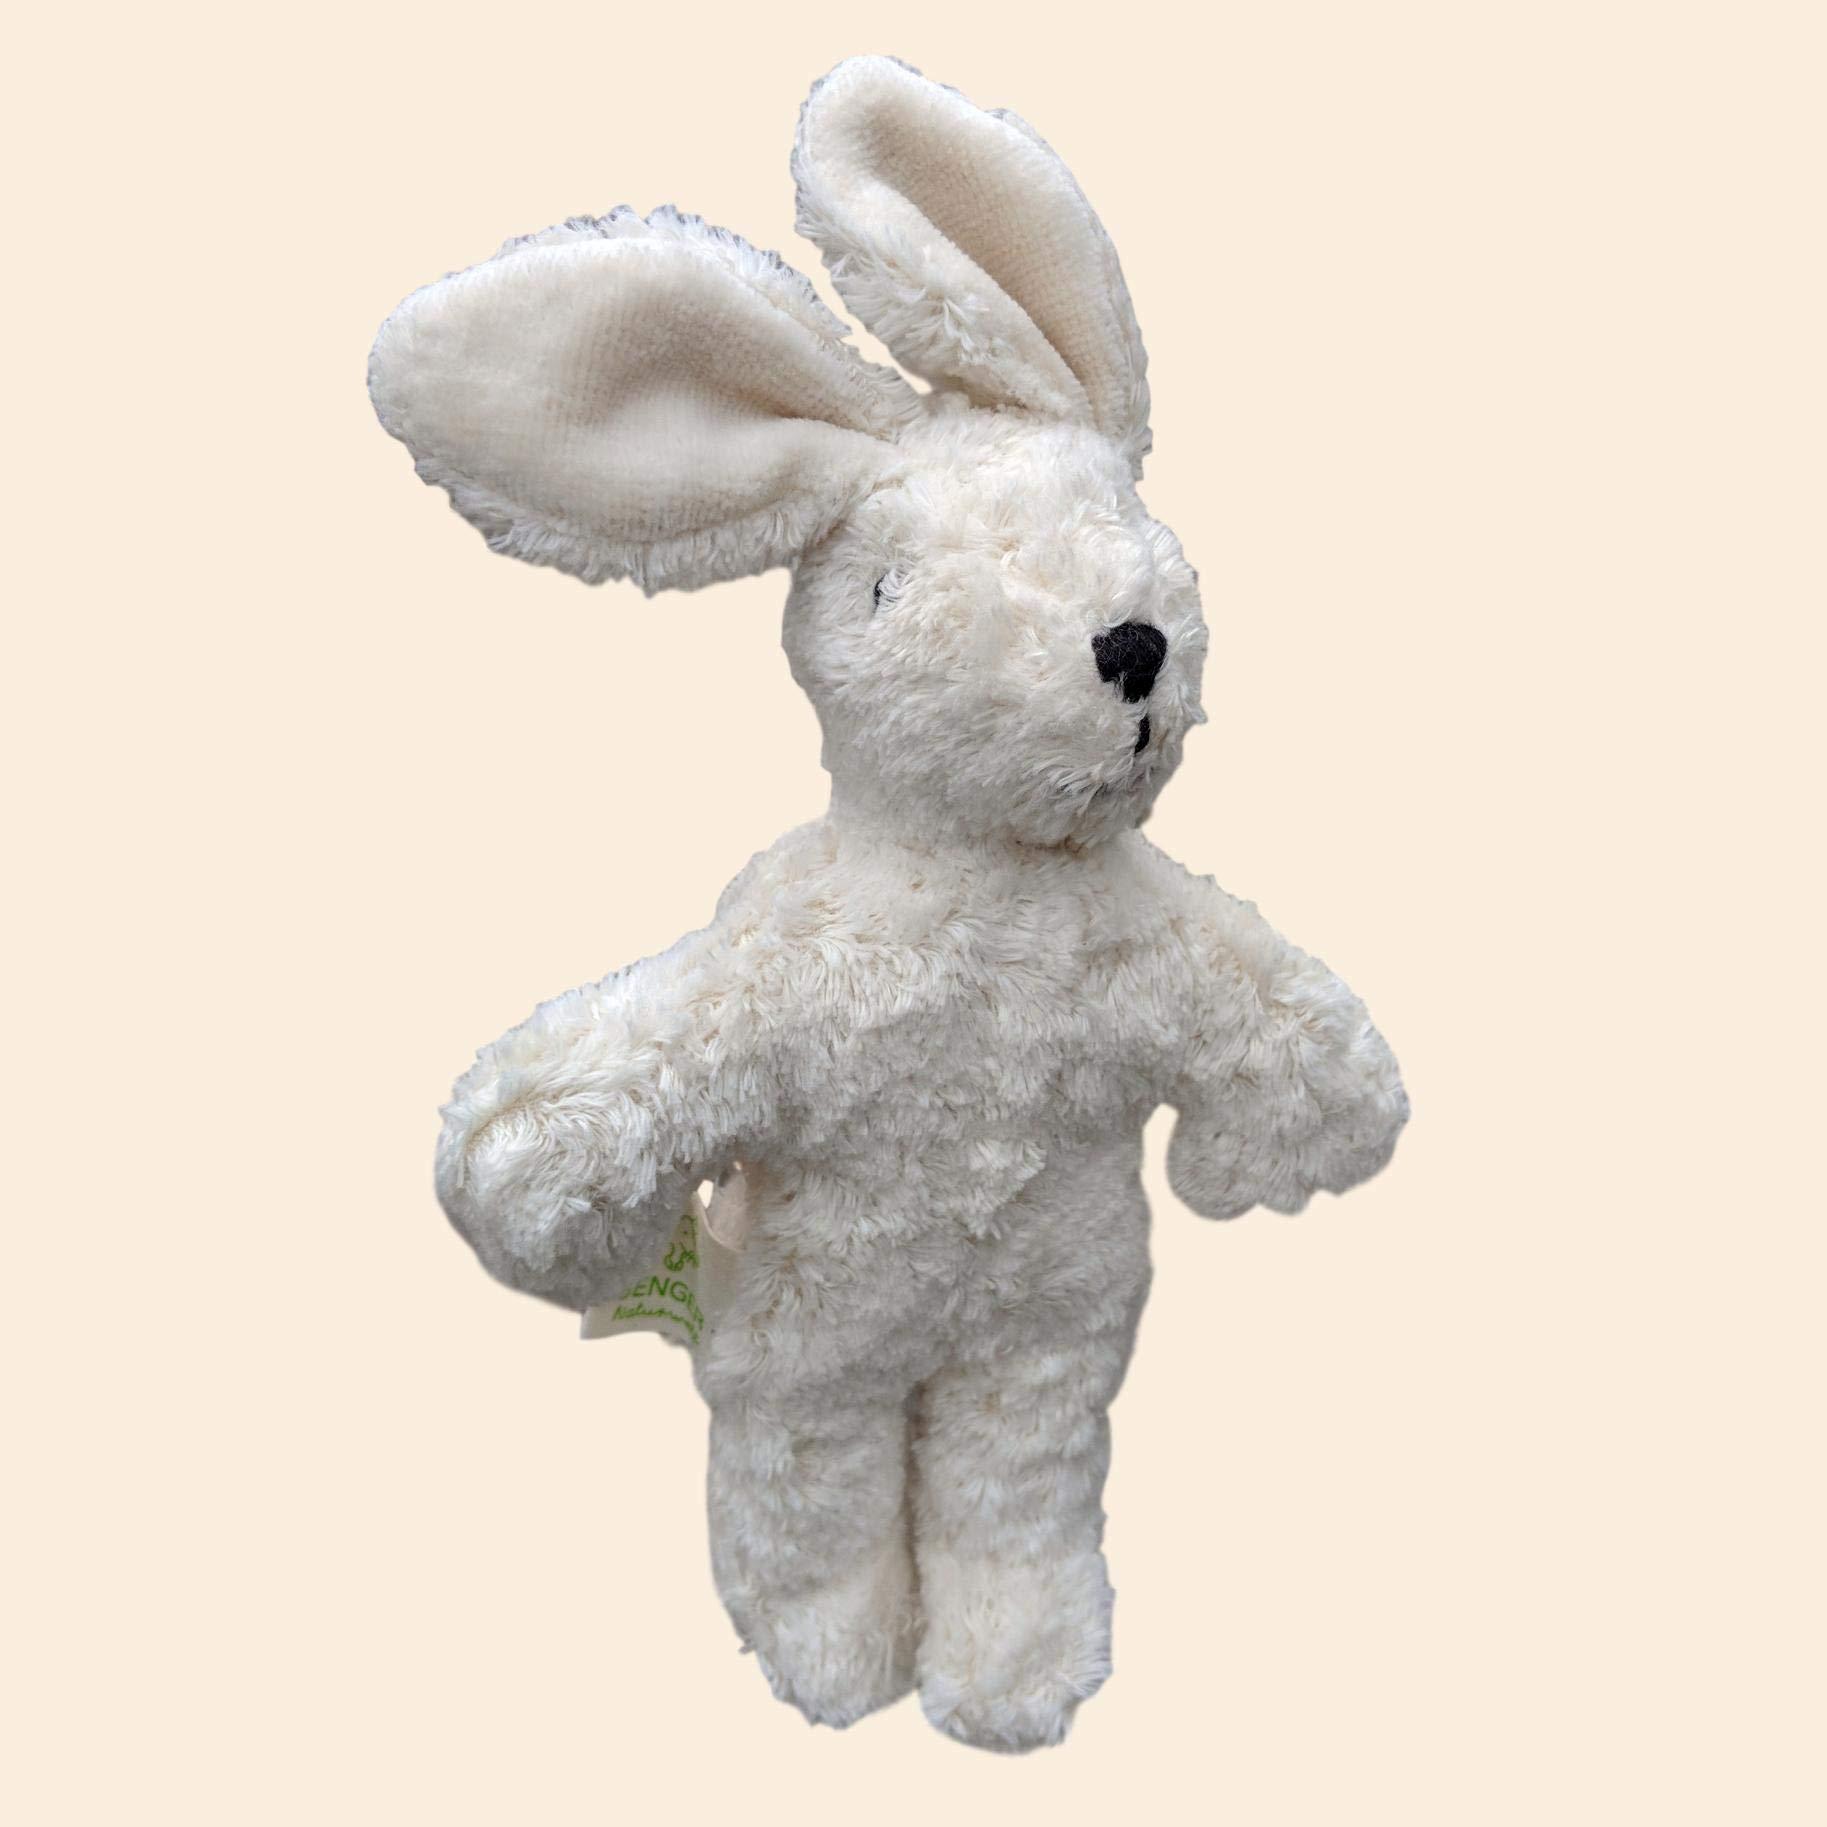 Senger Stuffed Animals - Floppy Baby Bunny Rabbit - Handmade 100% Organic Toy Large Size 9'' White by Senger